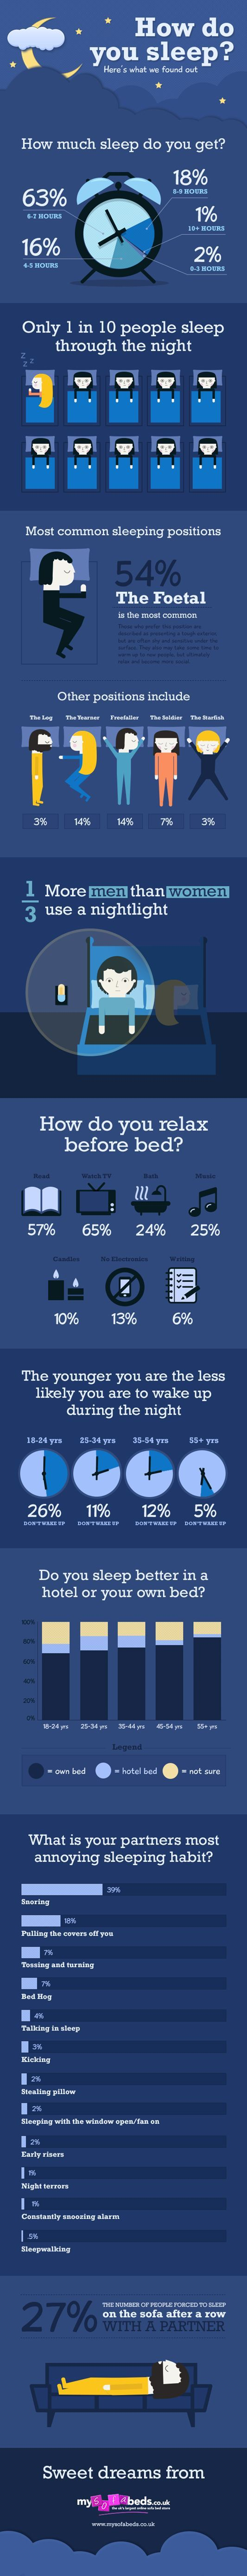 Interesting Facts About Sleep. #sleep #health #wellness | https://sellfy.com/p/zPQA